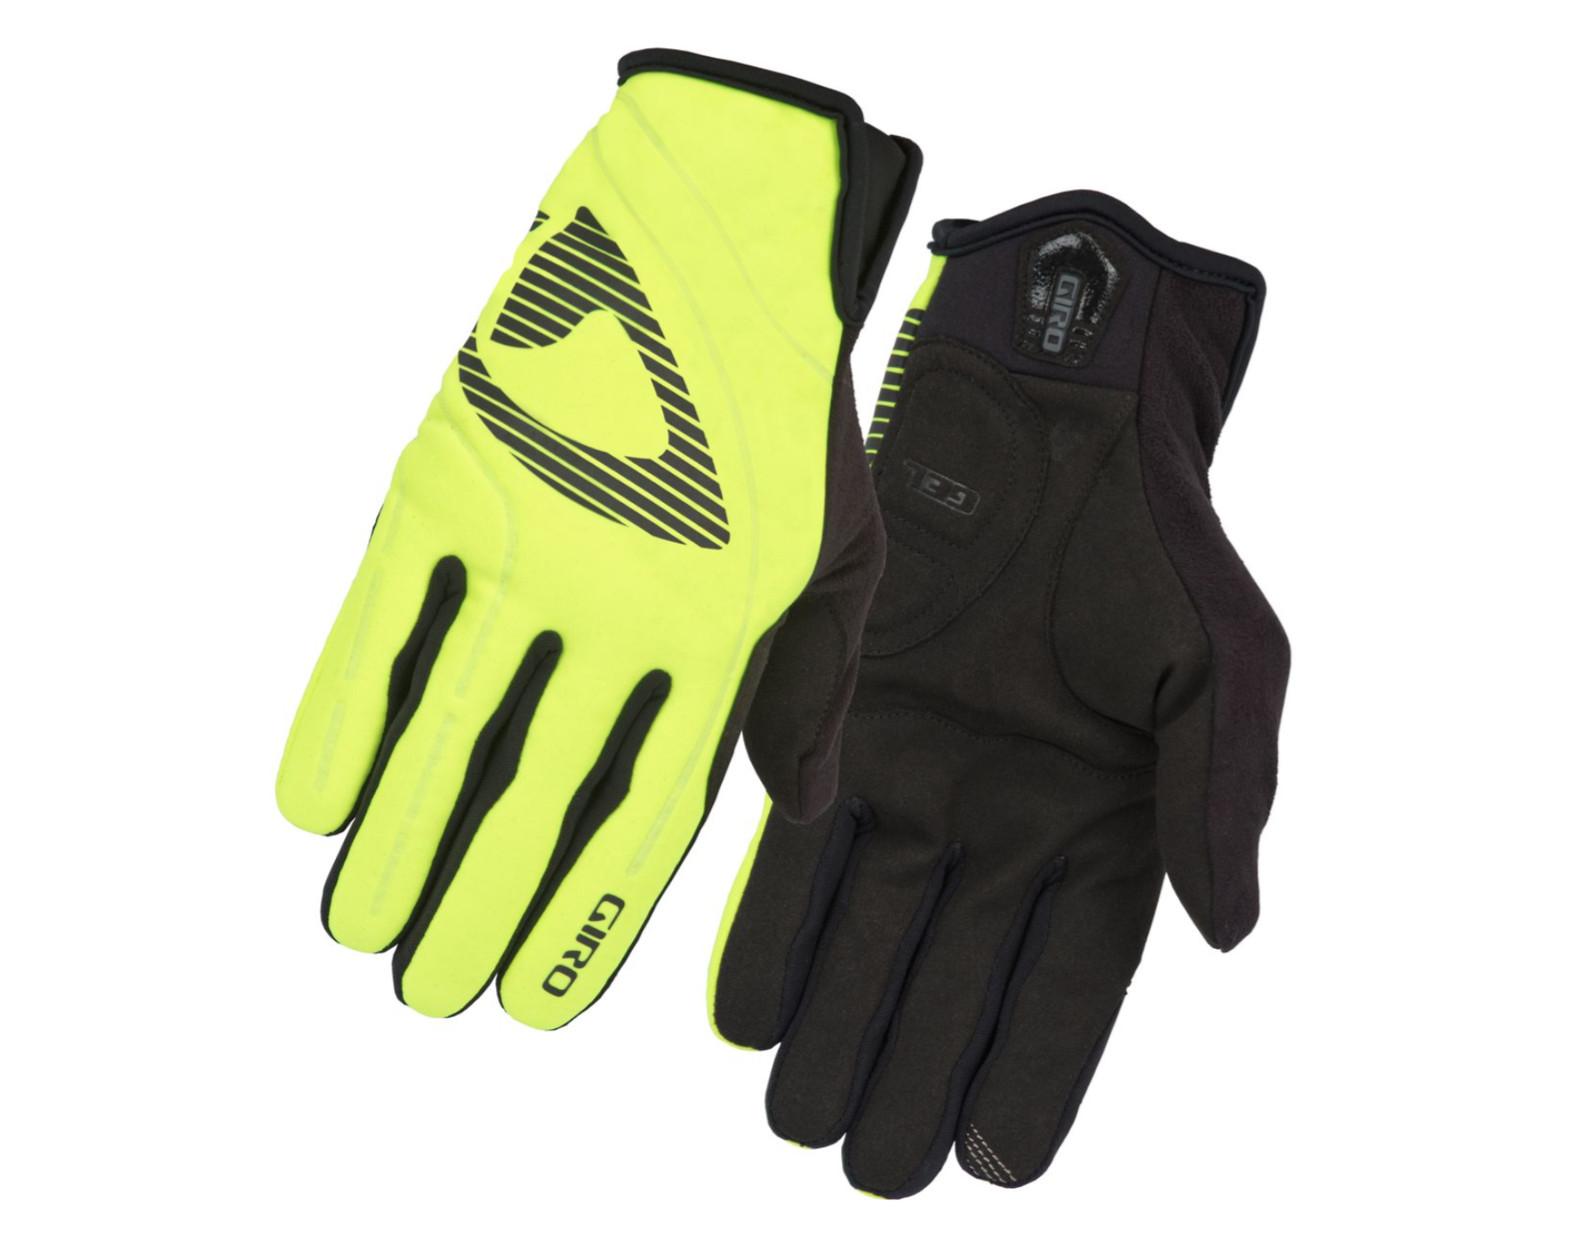 Giro Blaze Gloves - Highlight Yellow : Black